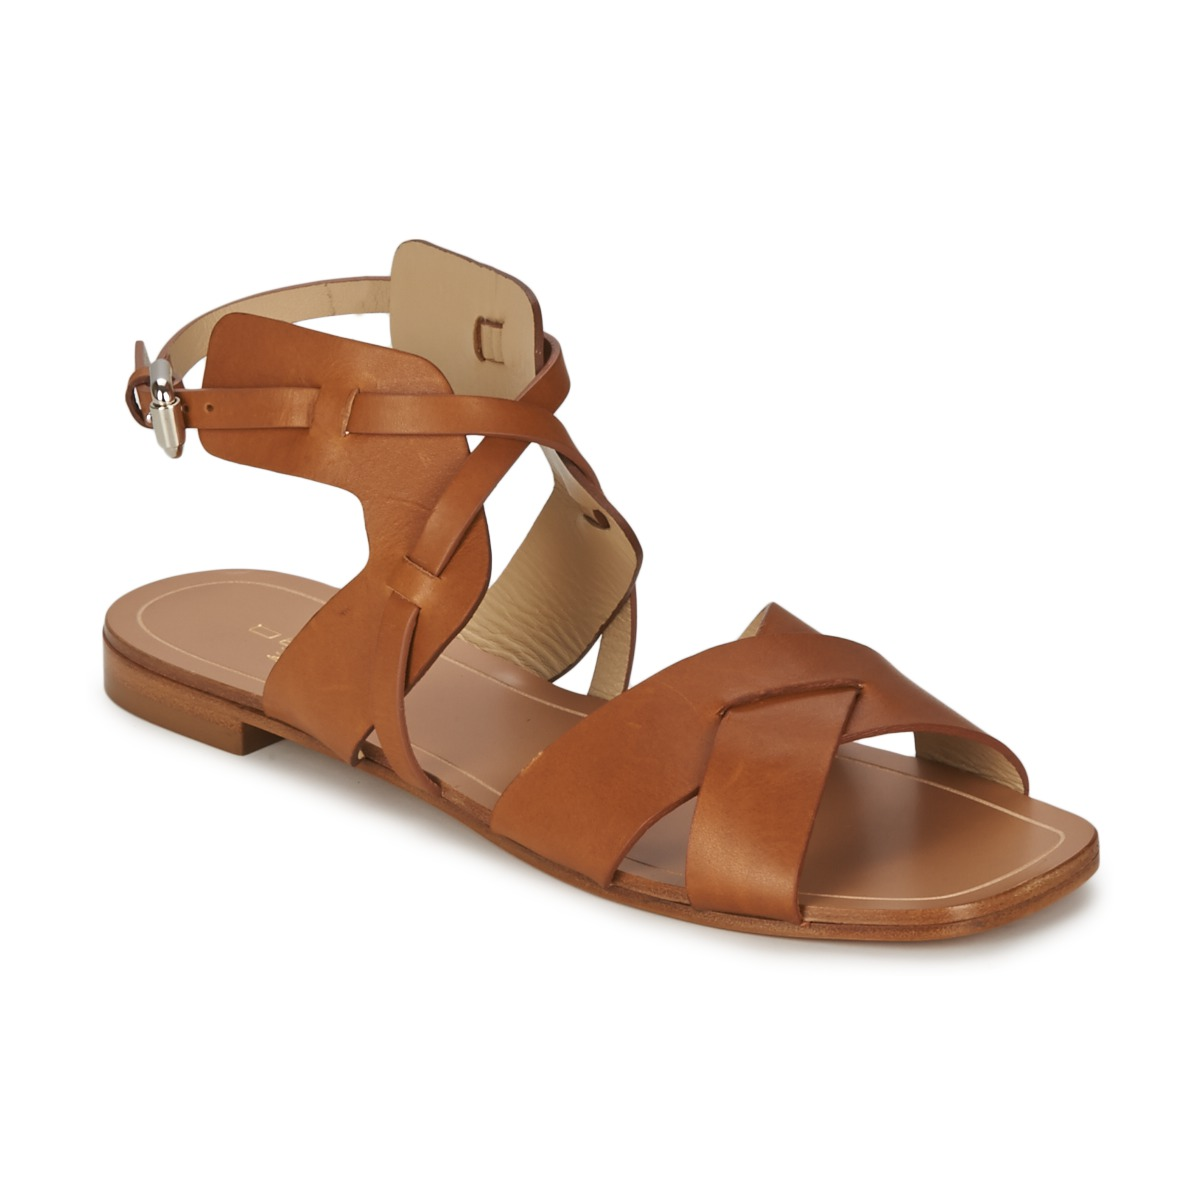 Sandale Etro 3947 Marron